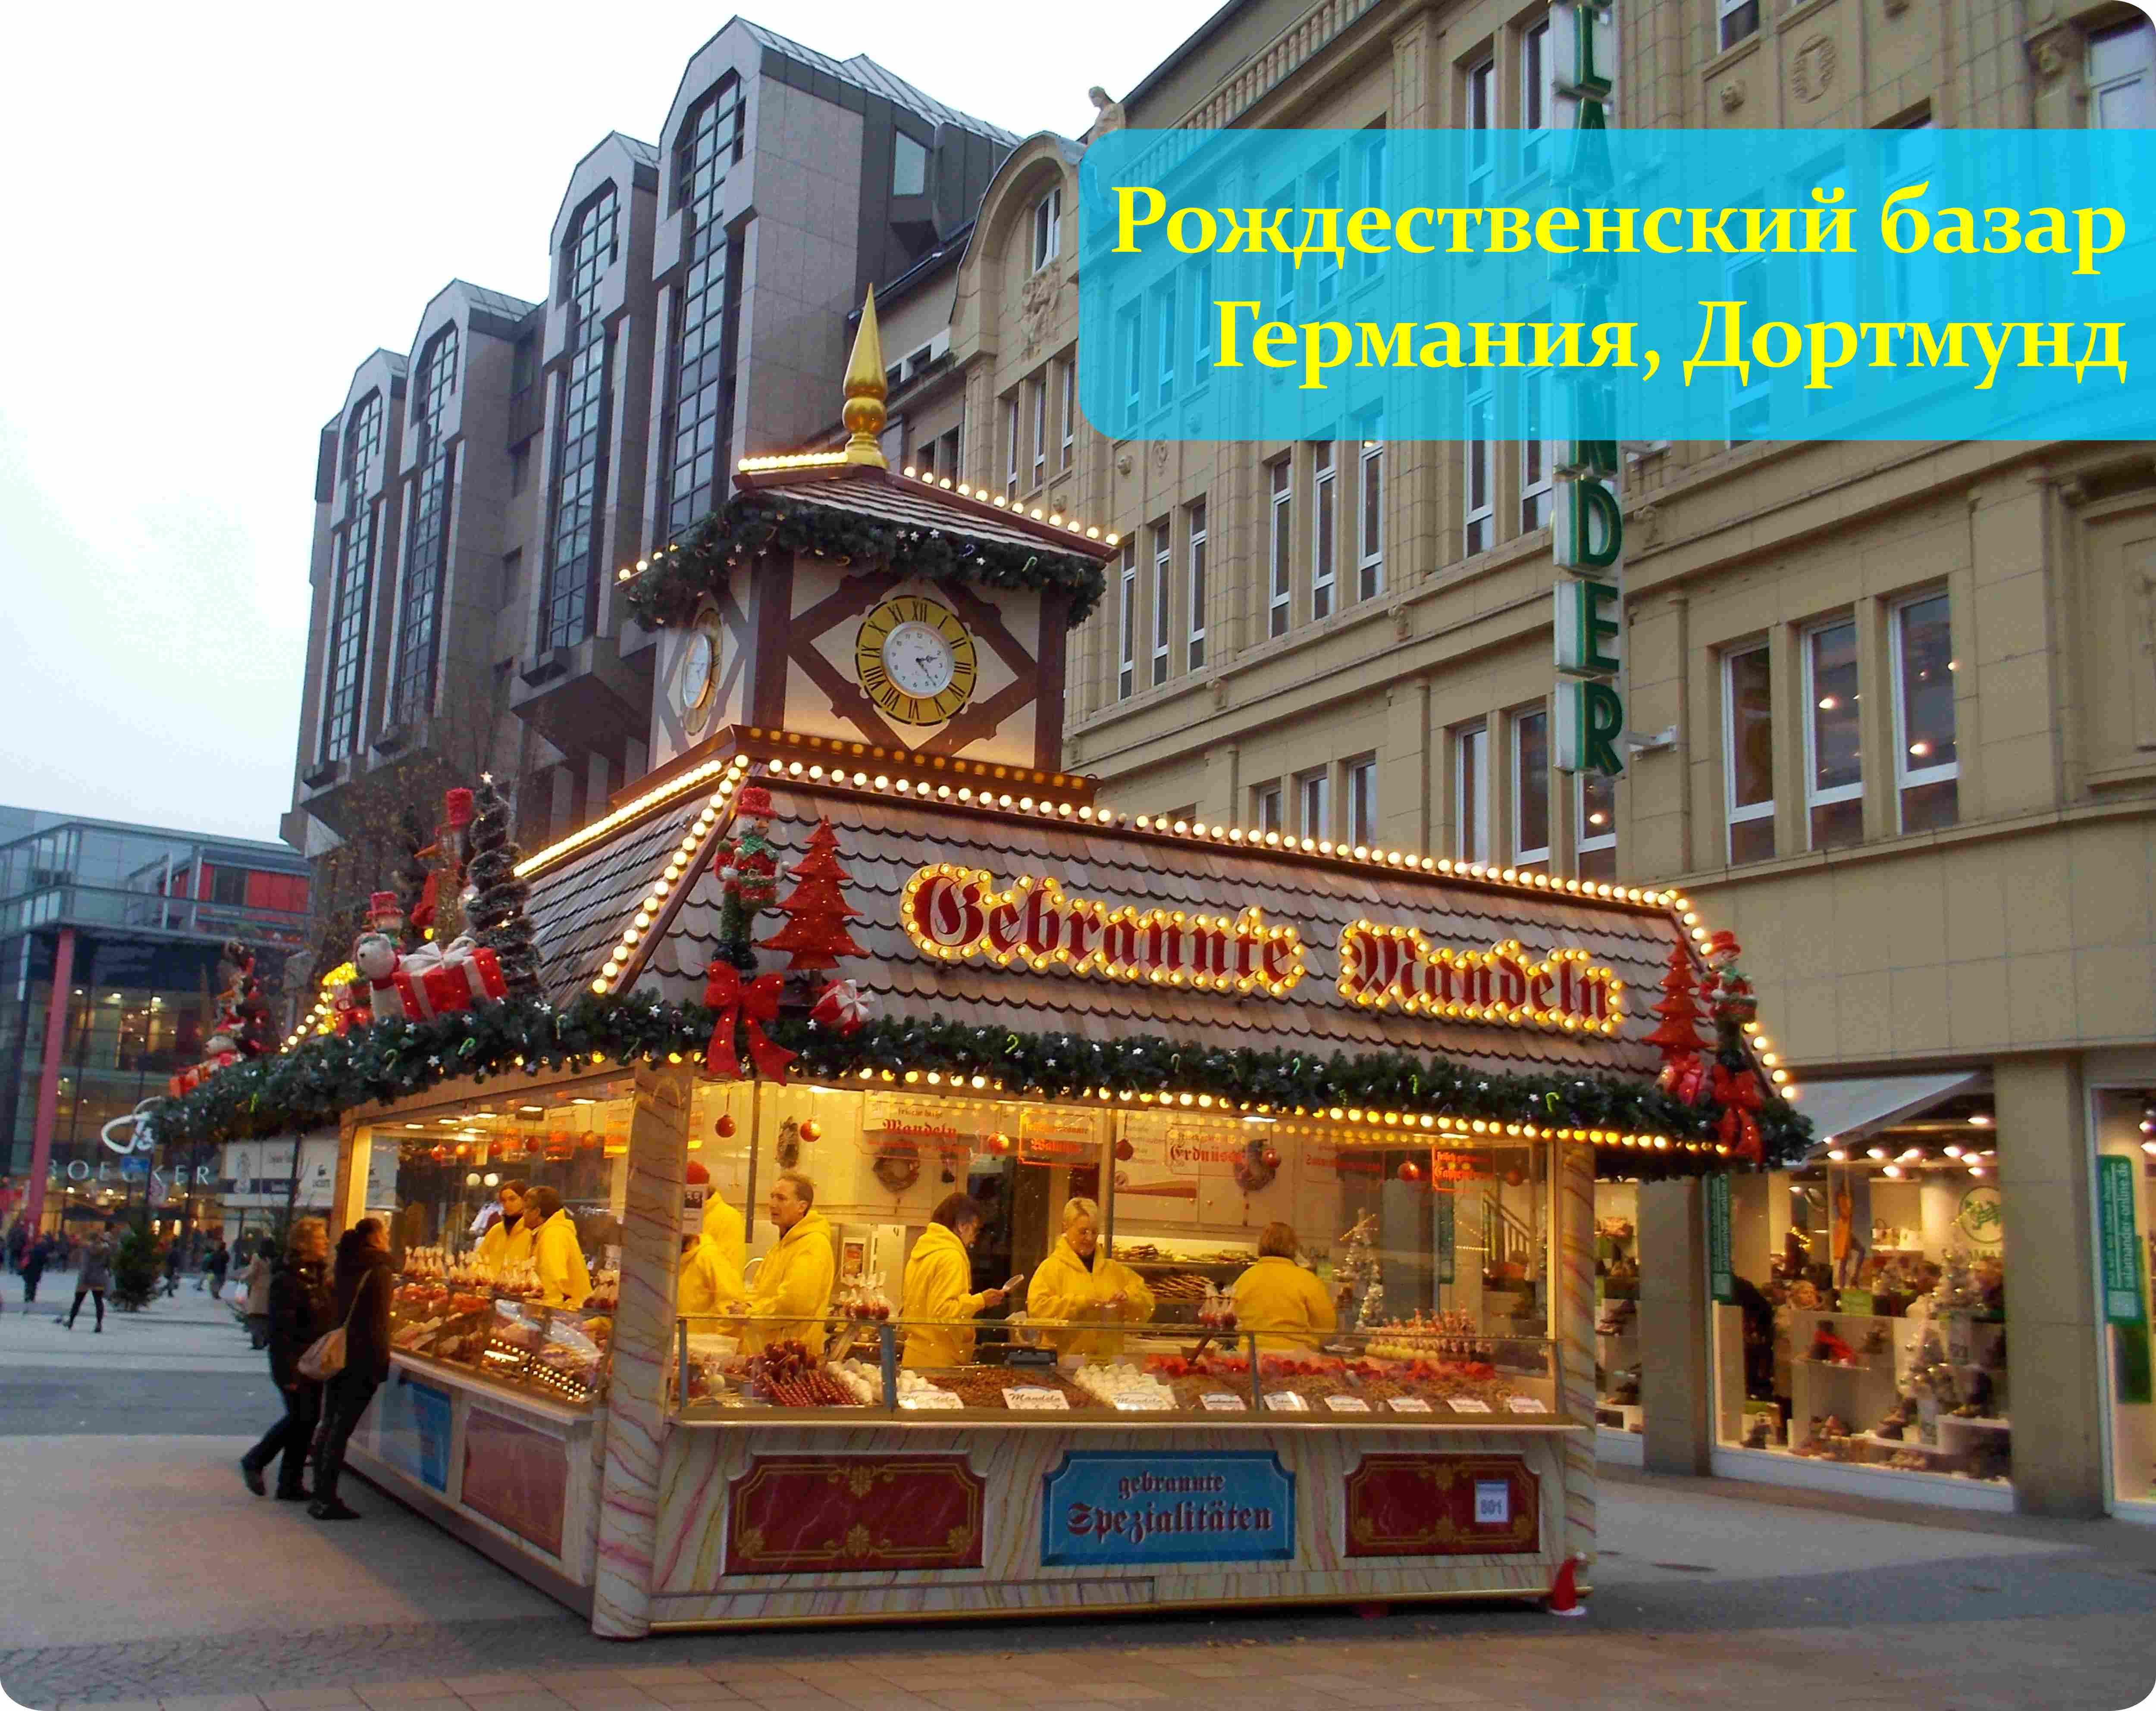 Рождественский базар в Дортмунде